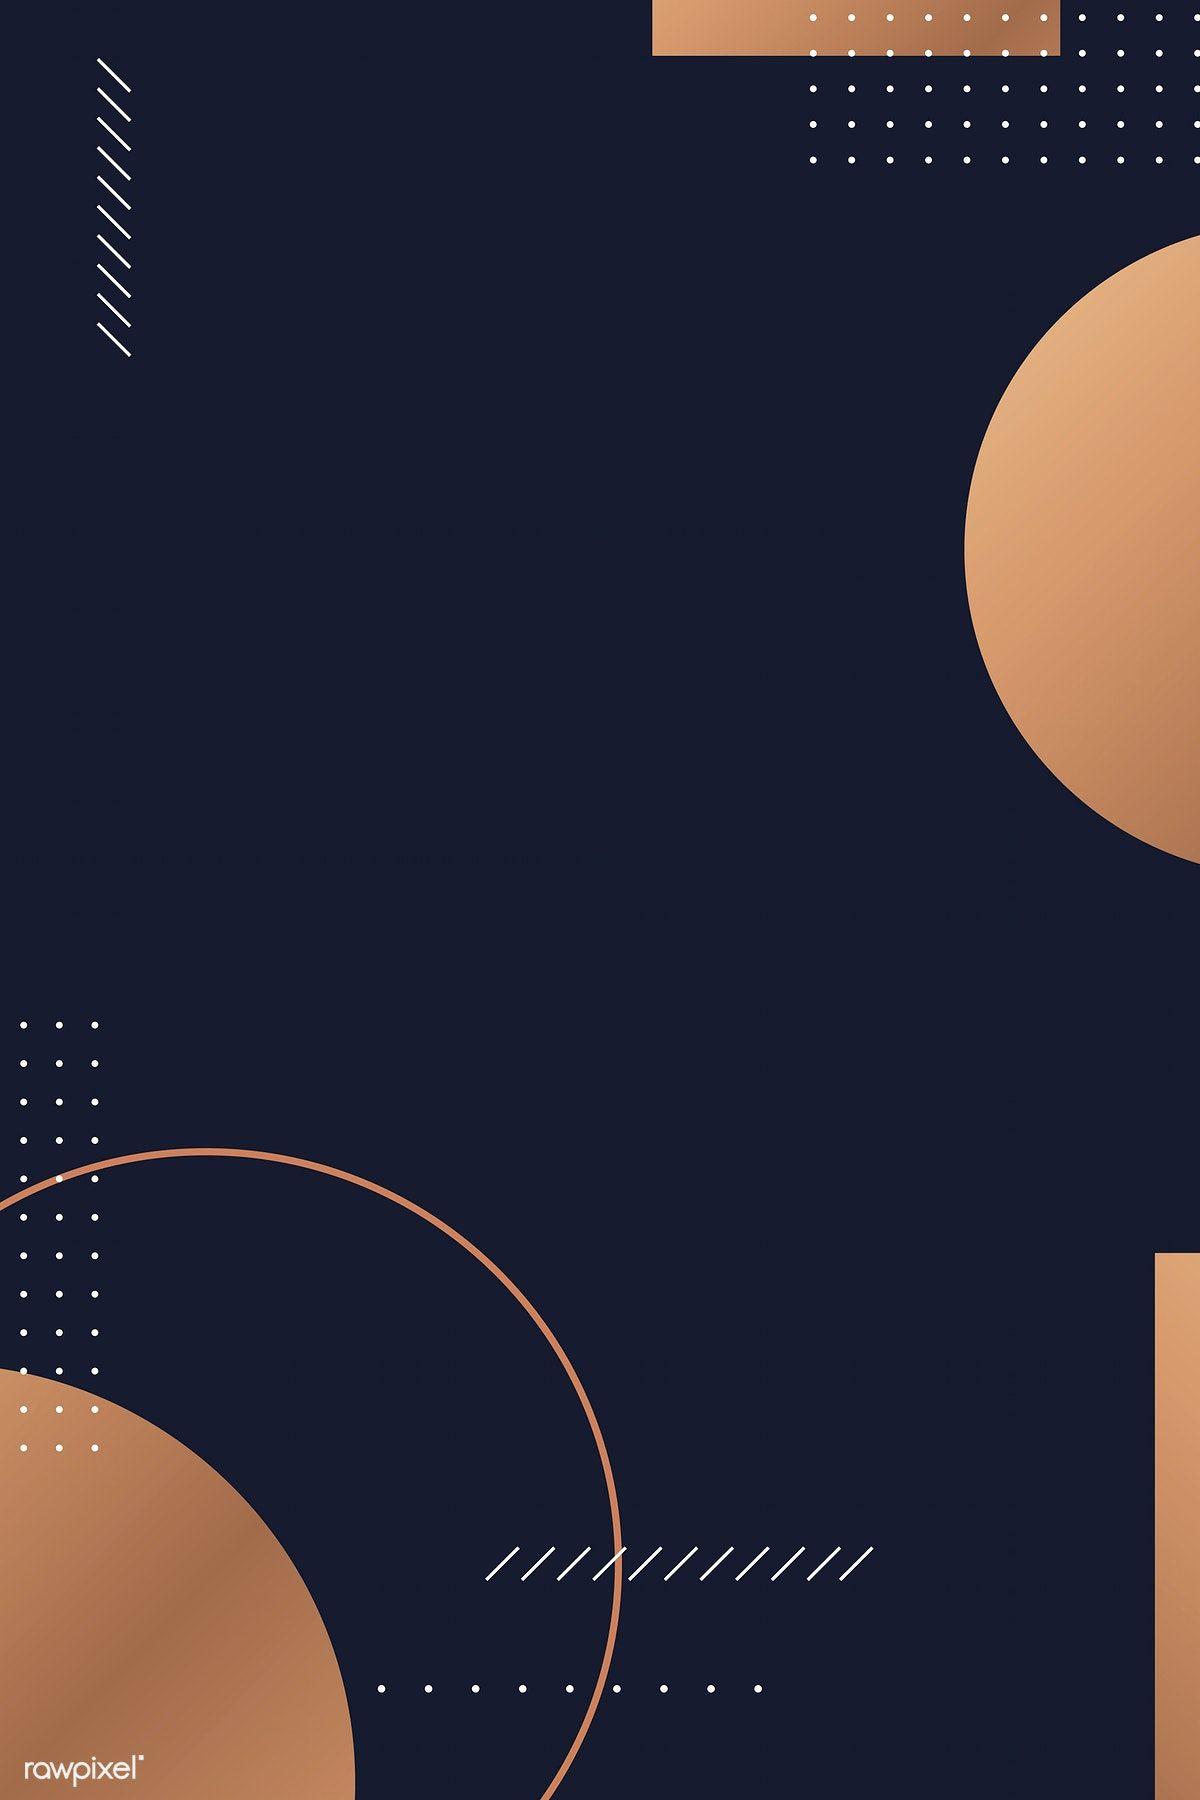 graphic design background templates